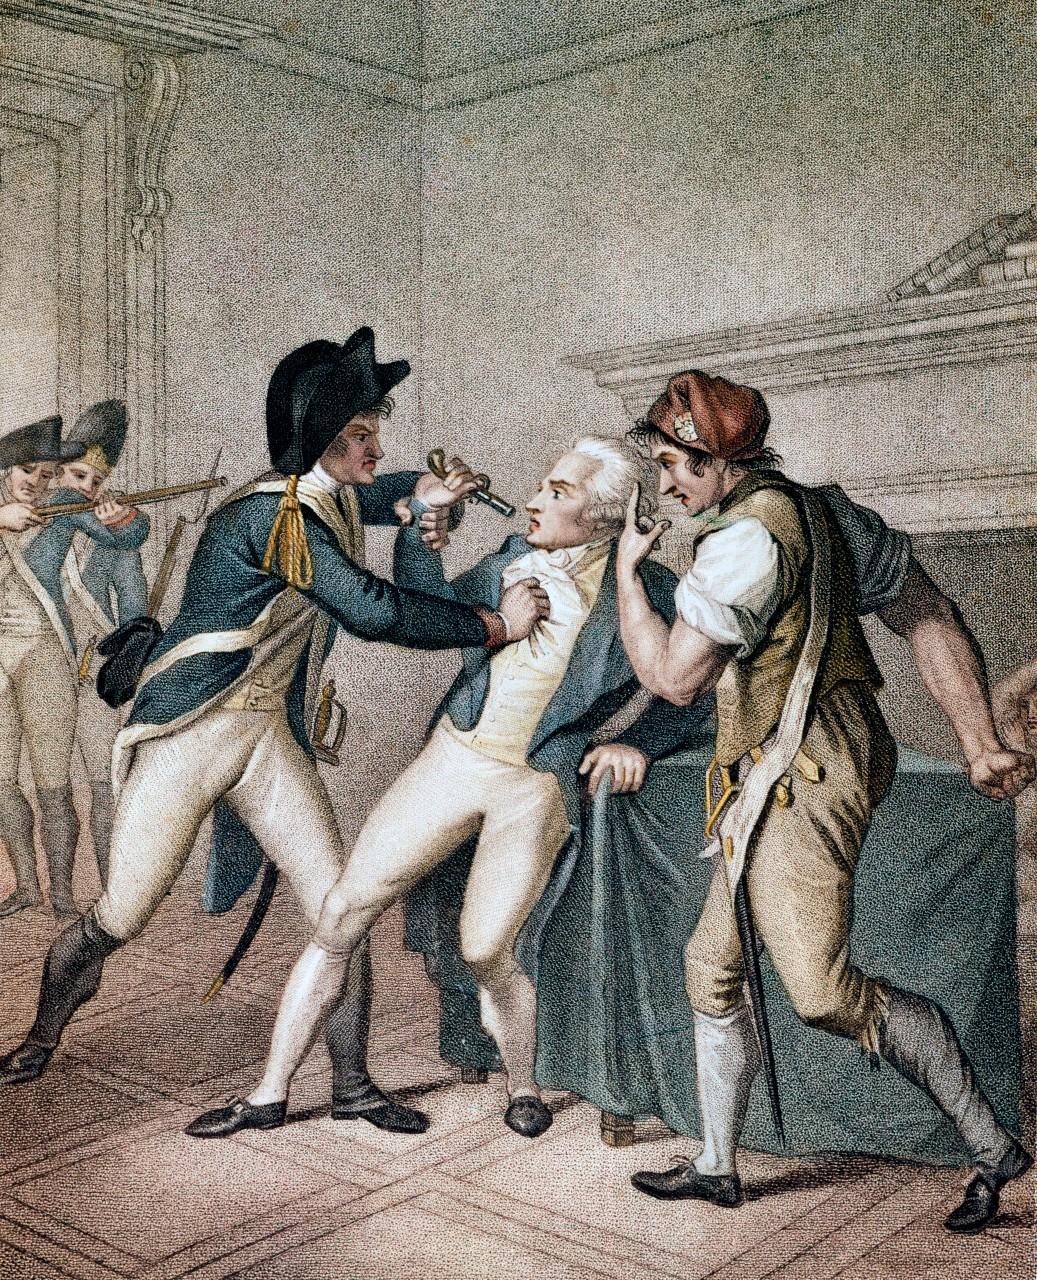 Arrestation de Robespierre, gravue de Giacomo Aliprandi, 1796.© Bianchetti/Leemage